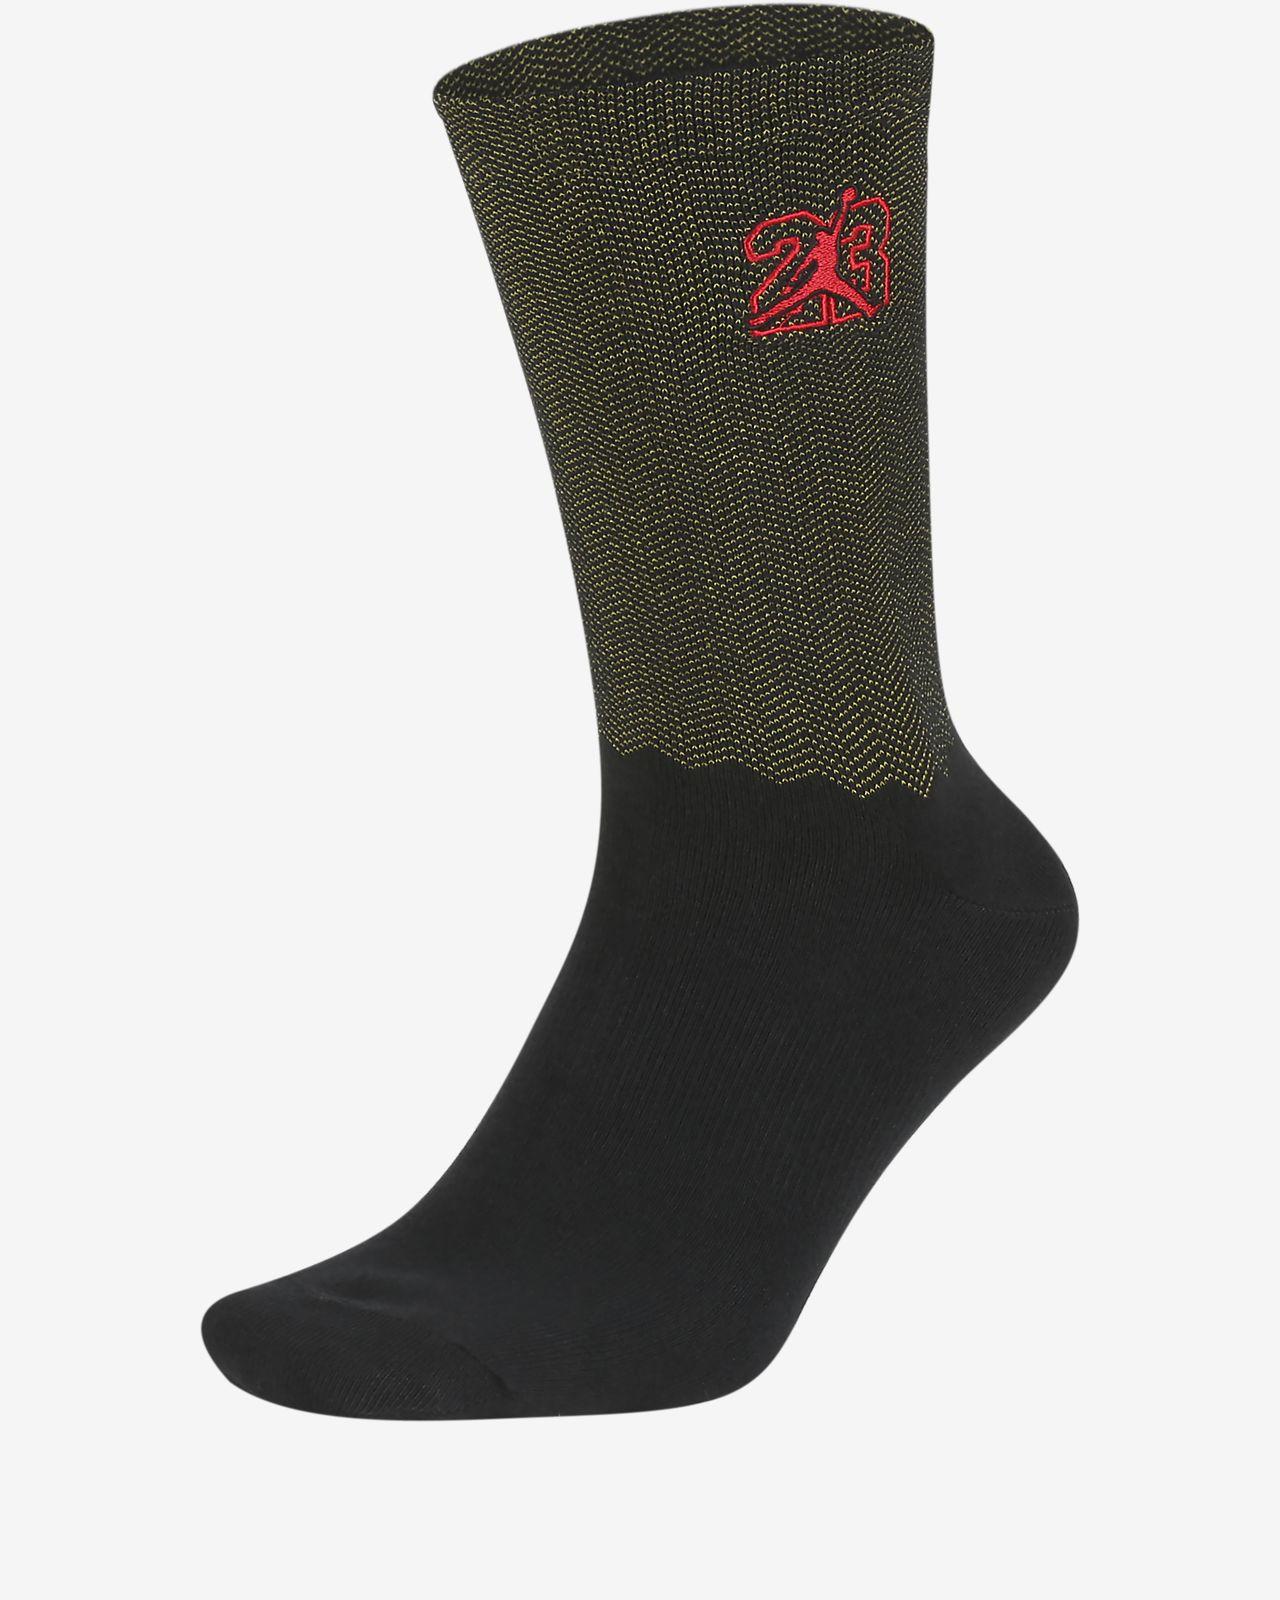 Calcetines deportivos Jordan Legacy